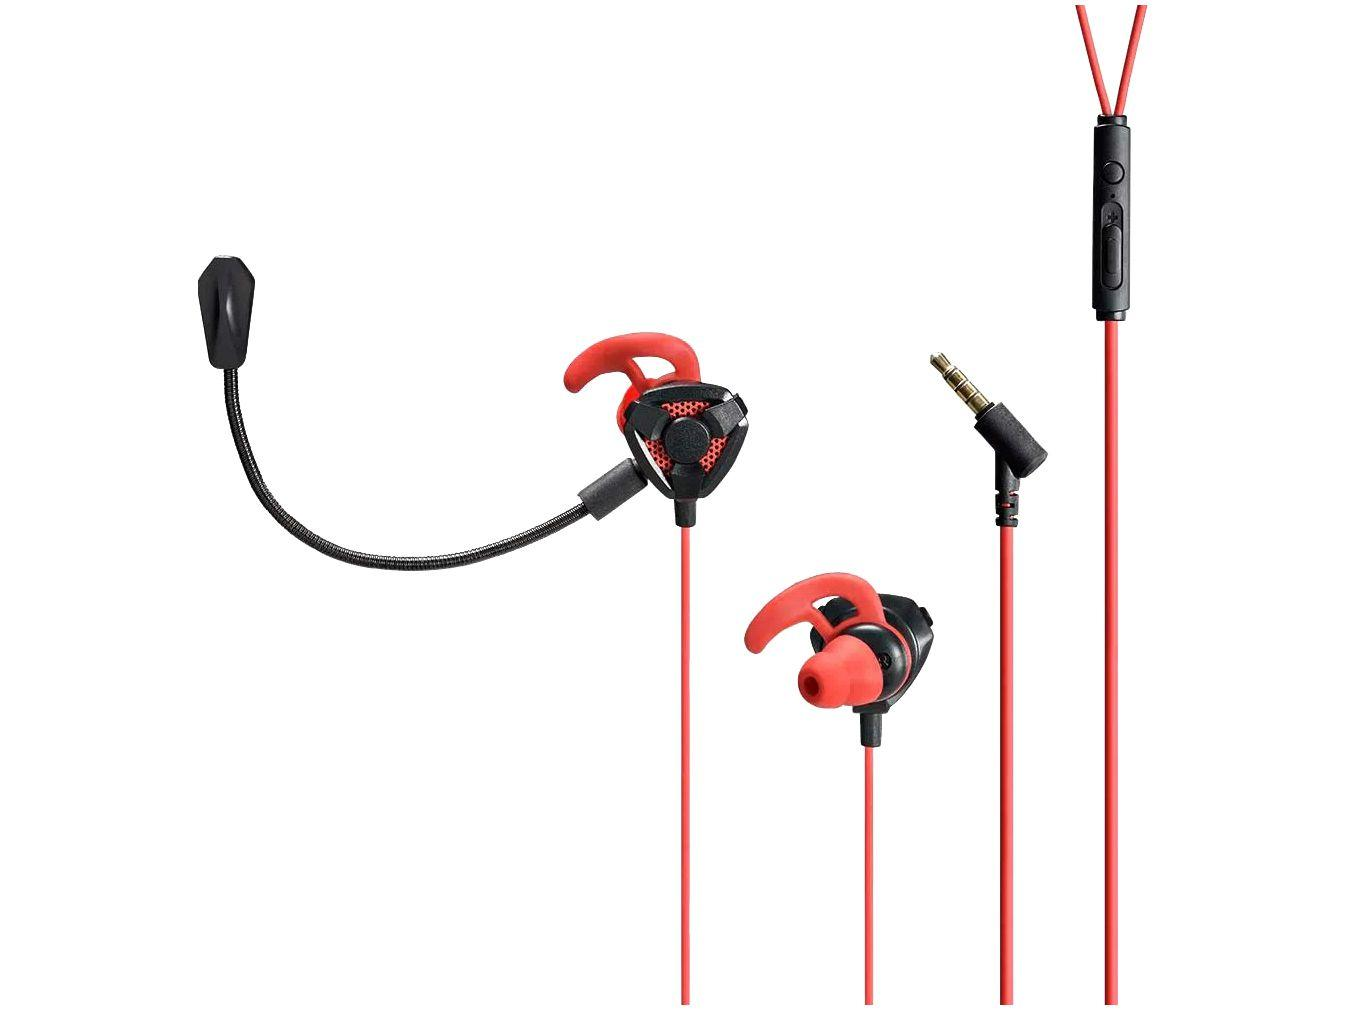 Fone de Ouvido Gamer Warrior com Microfone - Notebook PS4 Xbox One Intra-auricular